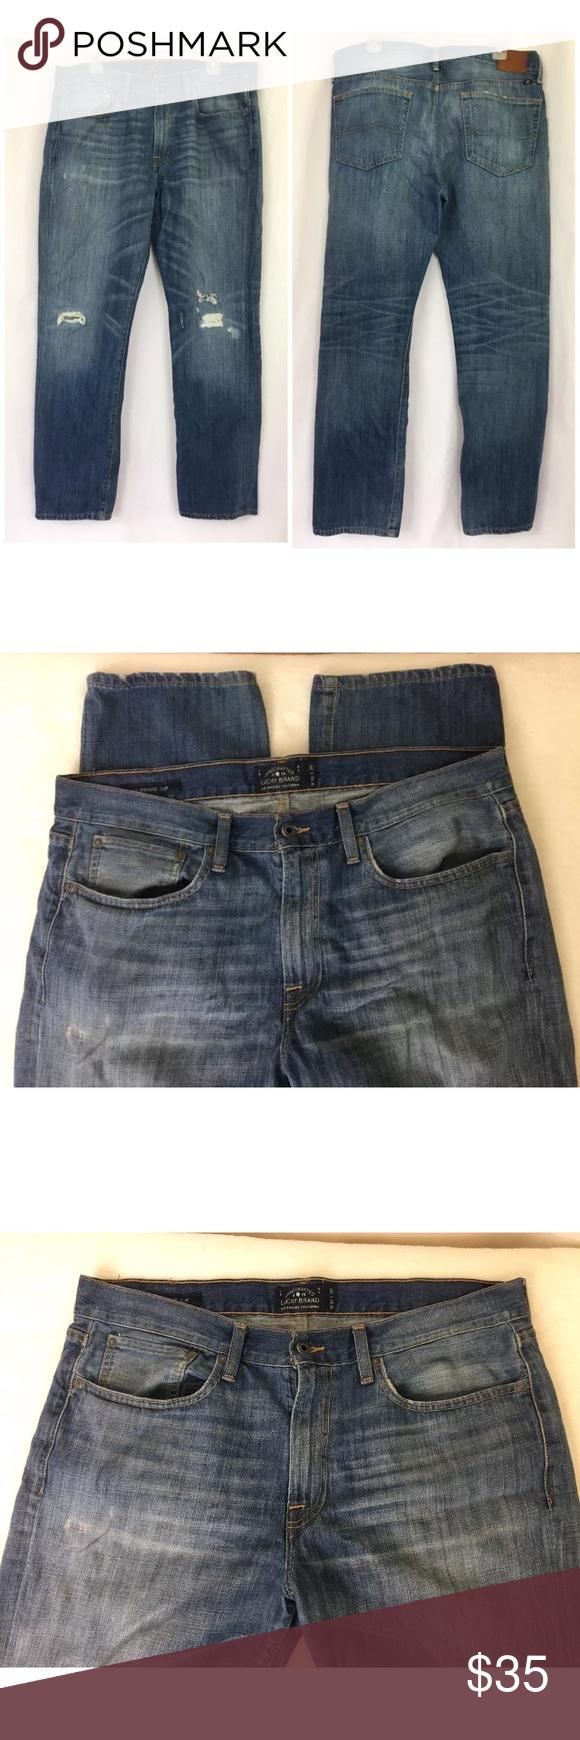 33730611897e Lucky Brand Jeans 36 30 121 Heritage Slim Lucky Brand Jeans 121 Heritage  Slim